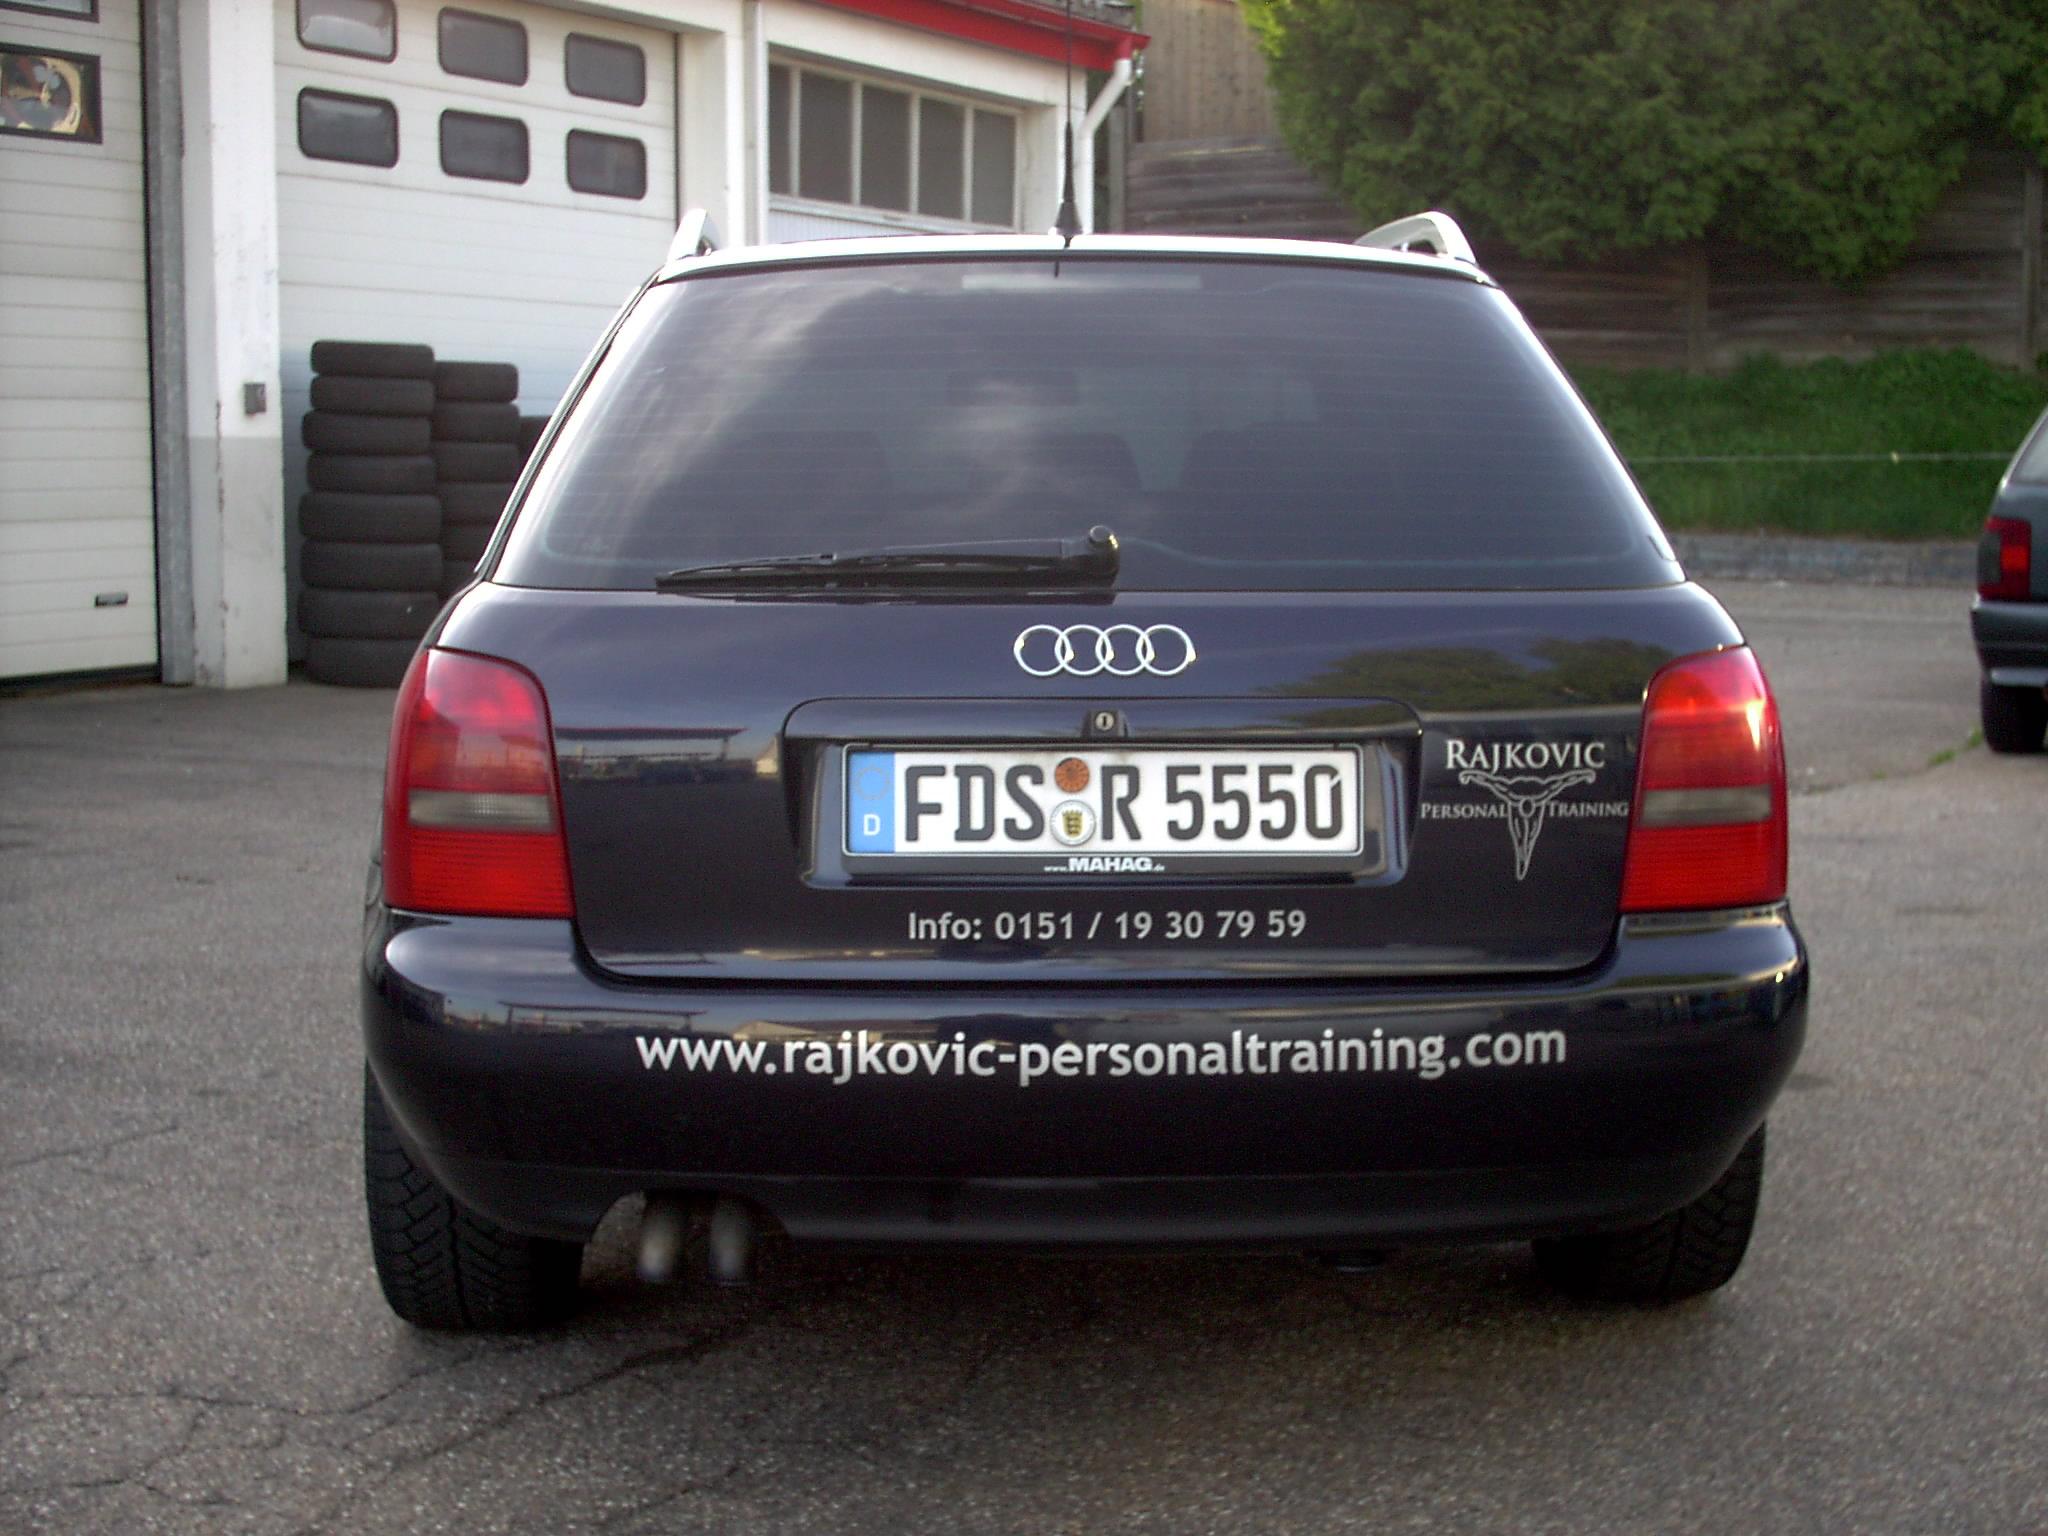 Werbetechnik_Audi_Rajkovic_3